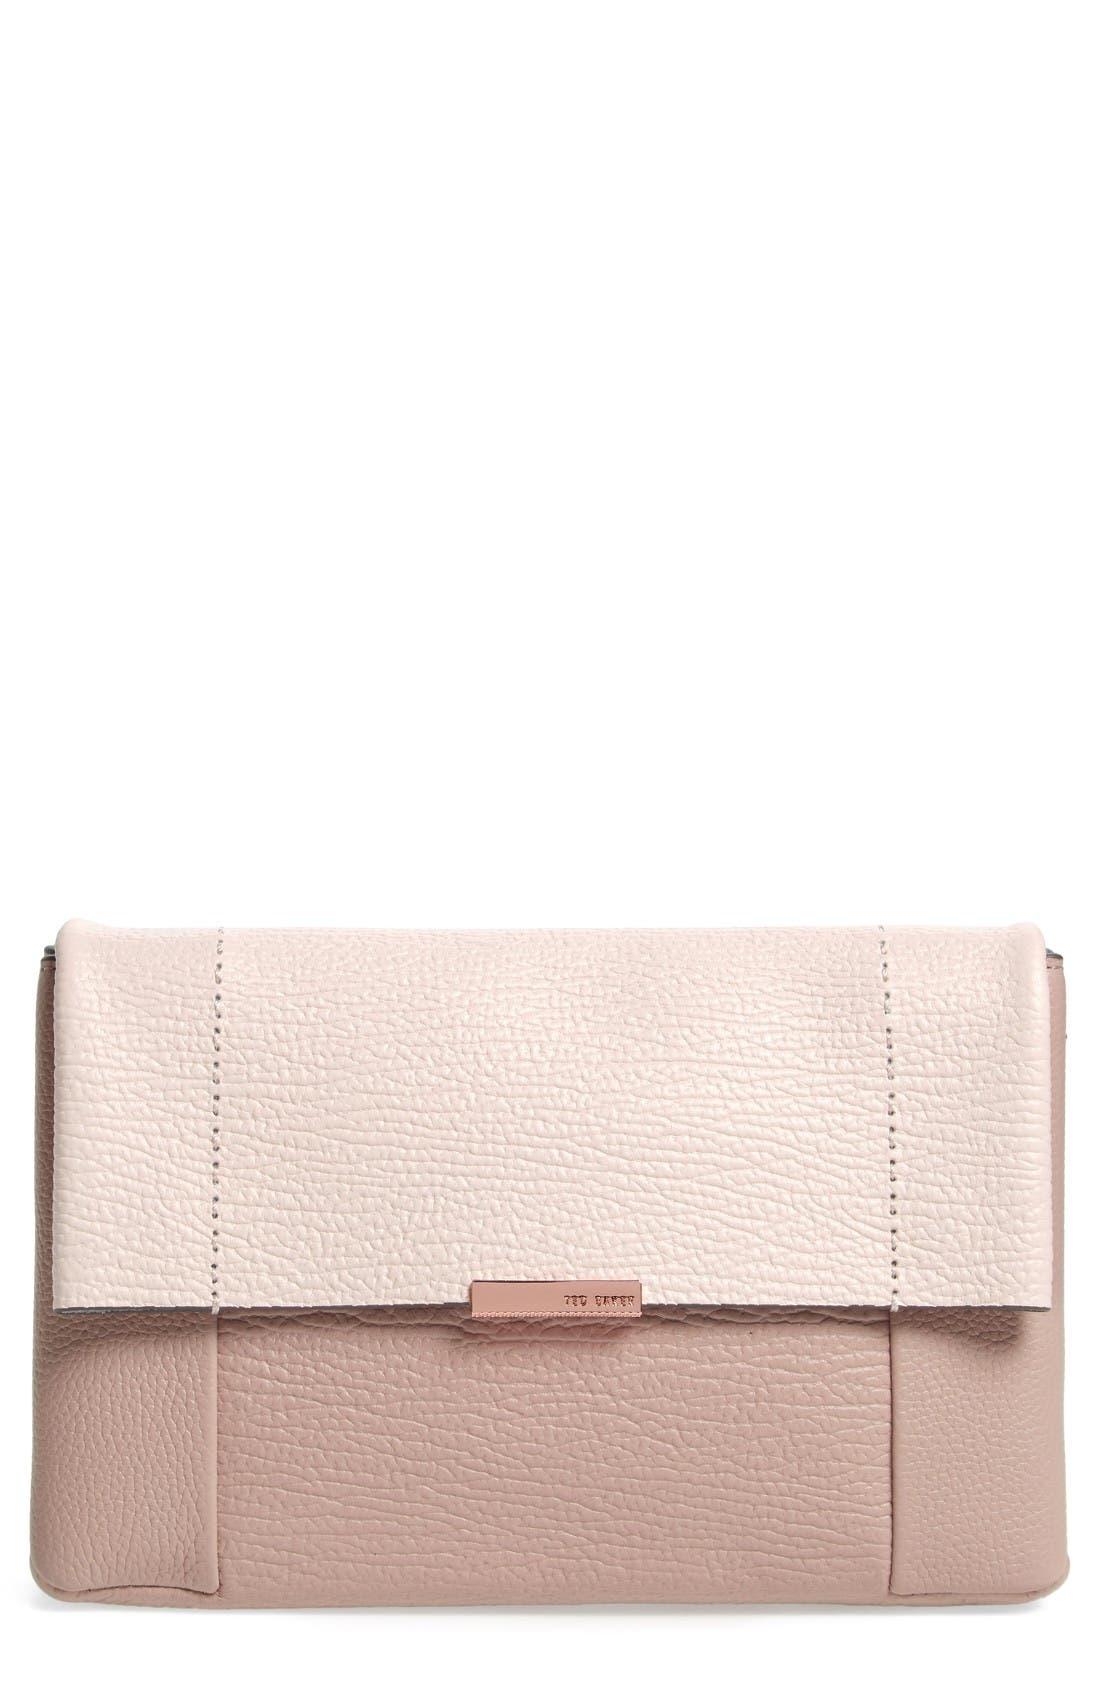 Ted Baker London Parson Leather Crossbody Bag